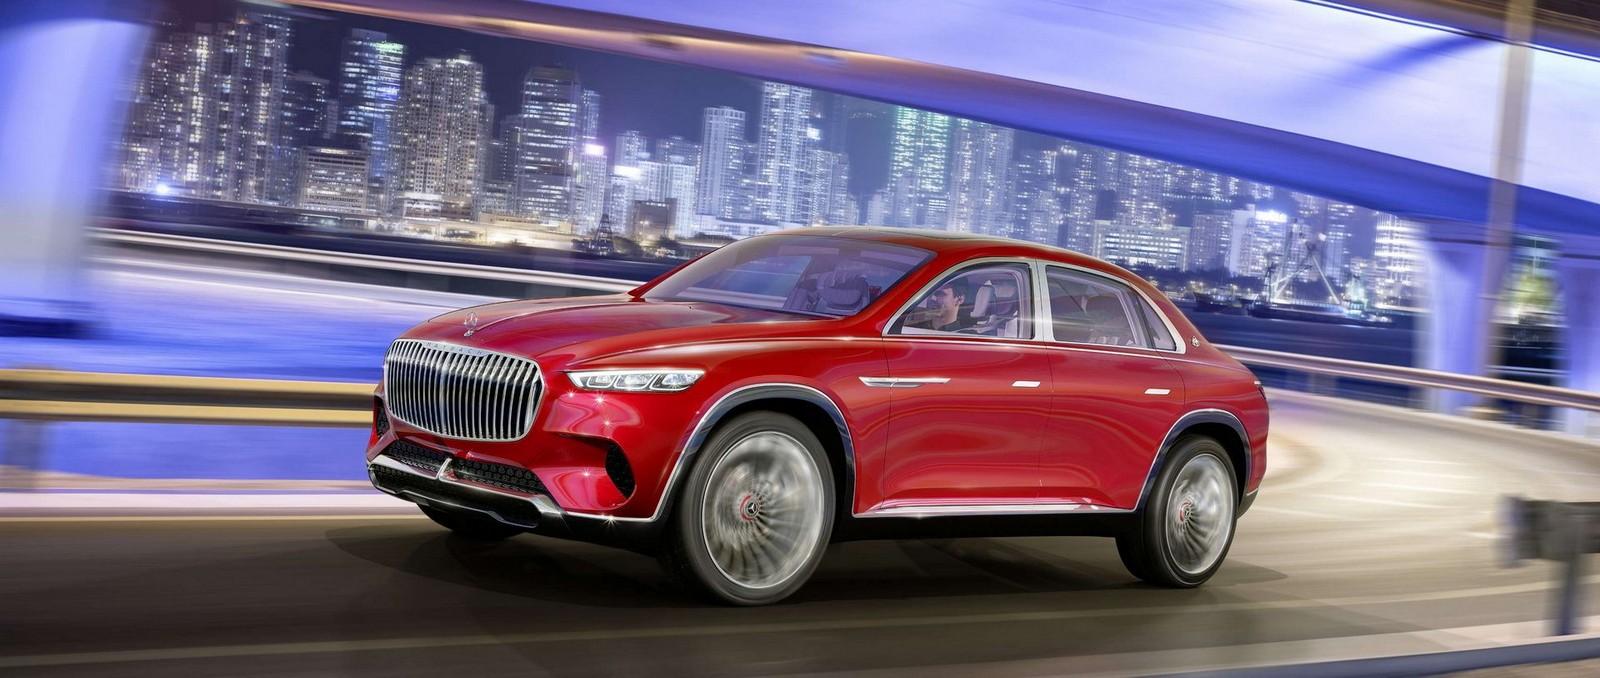 beijing 2018 mercedes maybach ultimate luxury blog automobile. Black Bedroom Furniture Sets. Home Design Ideas